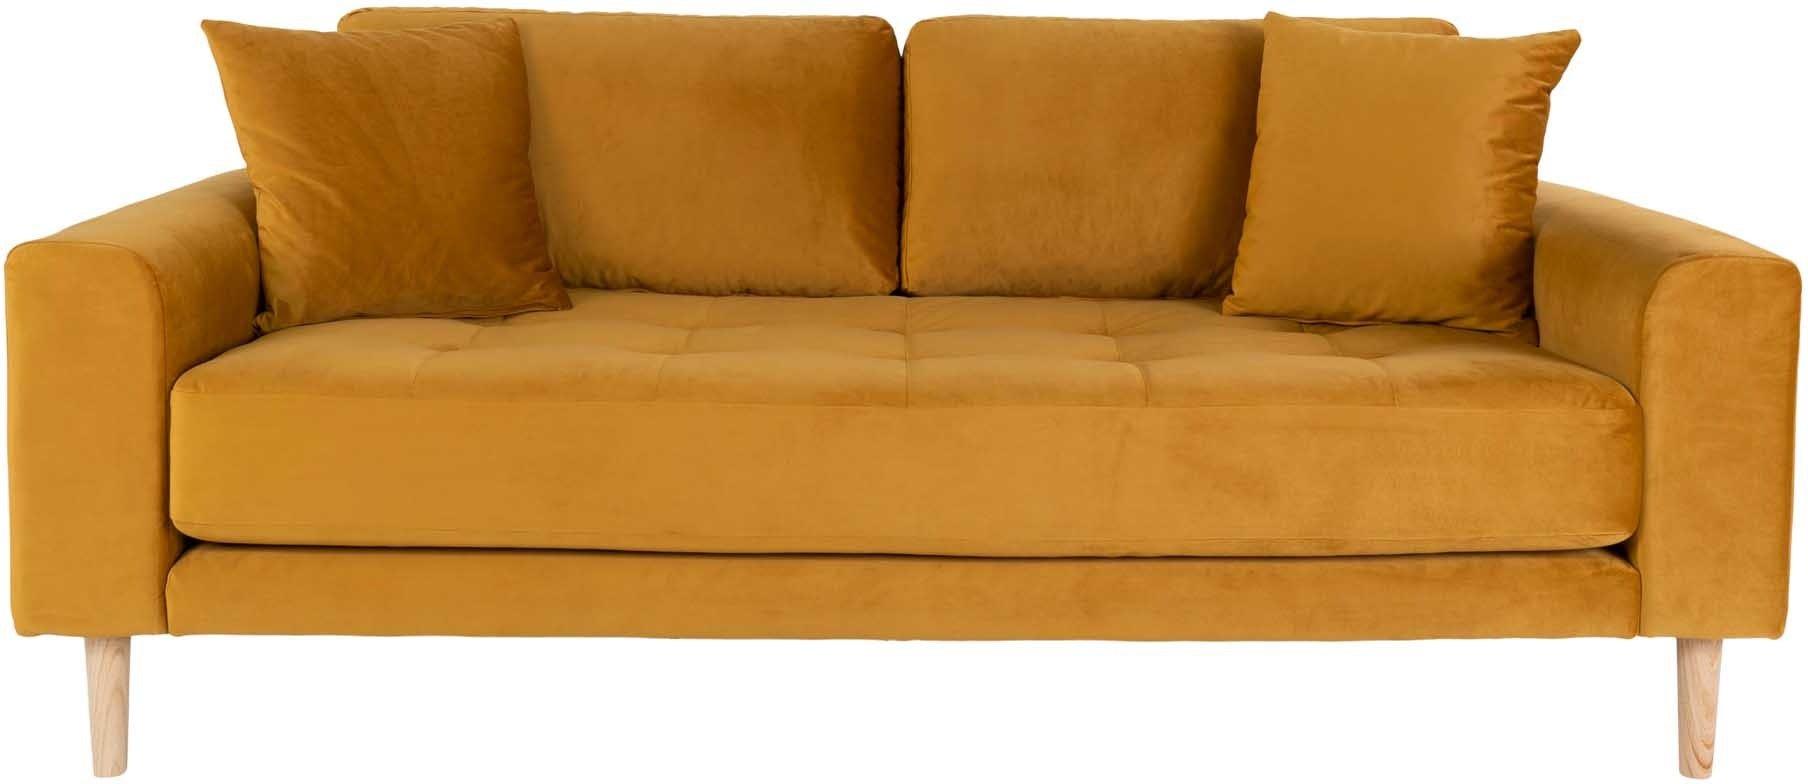 Køb Lido, 2,5-personers sofa, Velour by Nordby (H: 76 cm. B: 180 cm. L: 93 cm., Sennepgul)